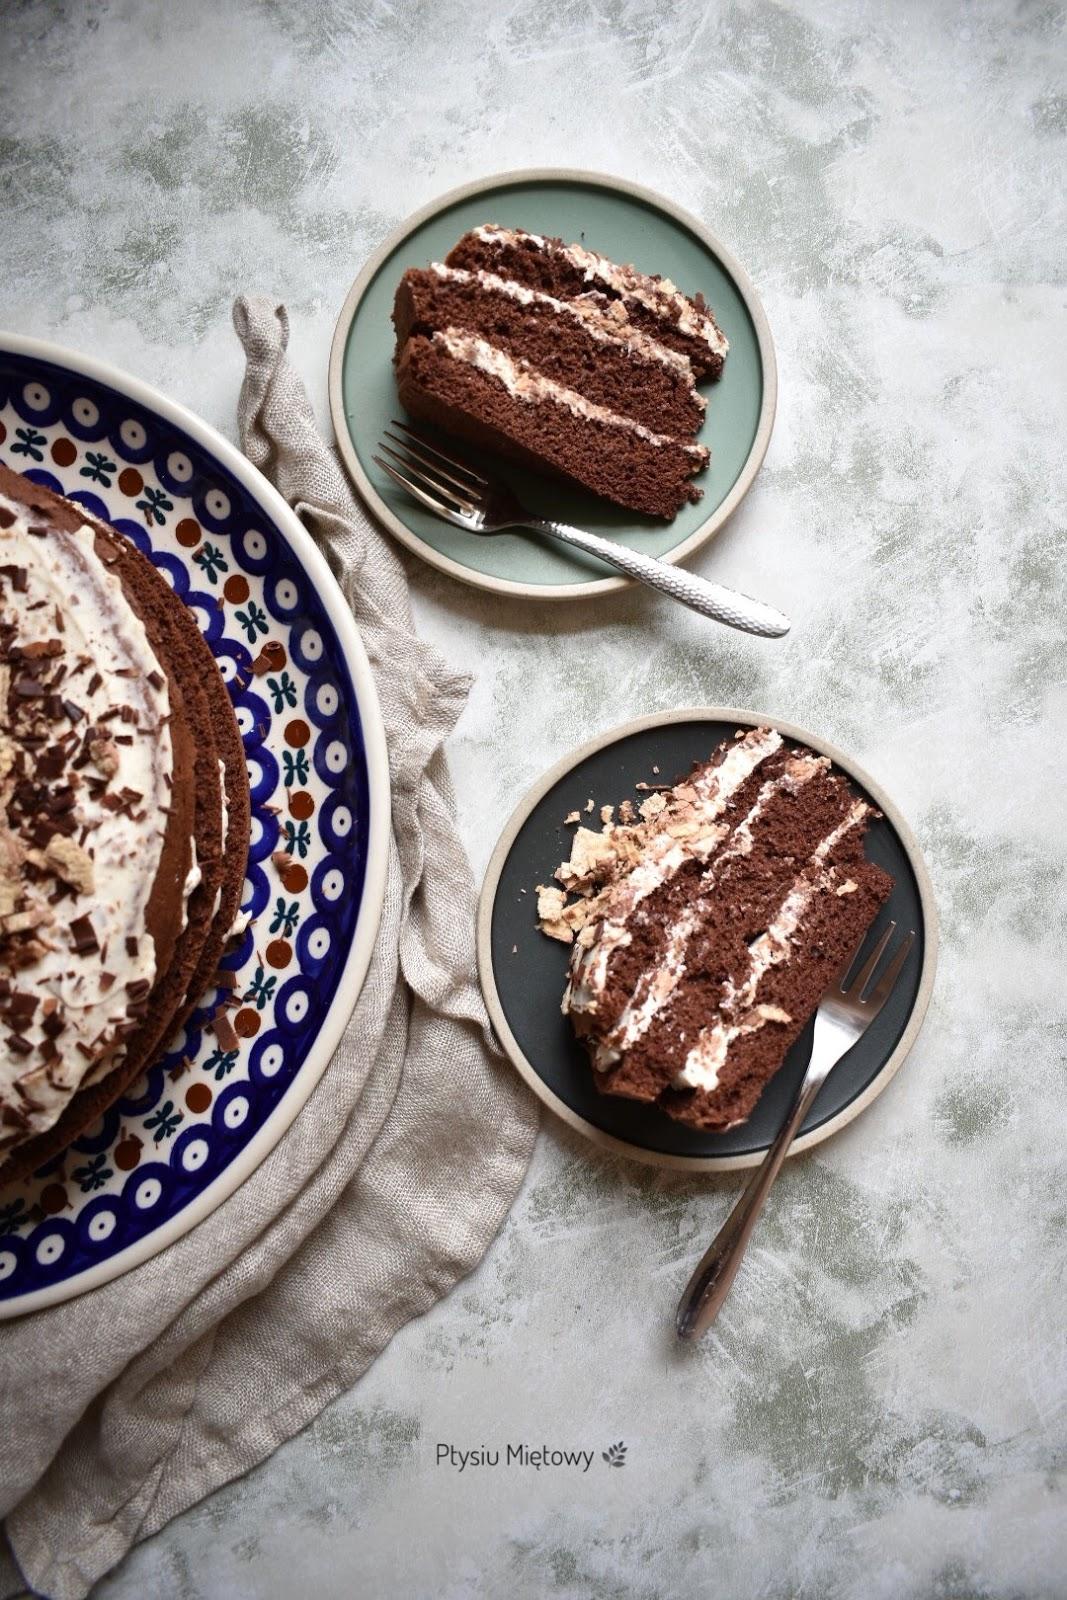 ciasto, deser, ptysiu meitowy